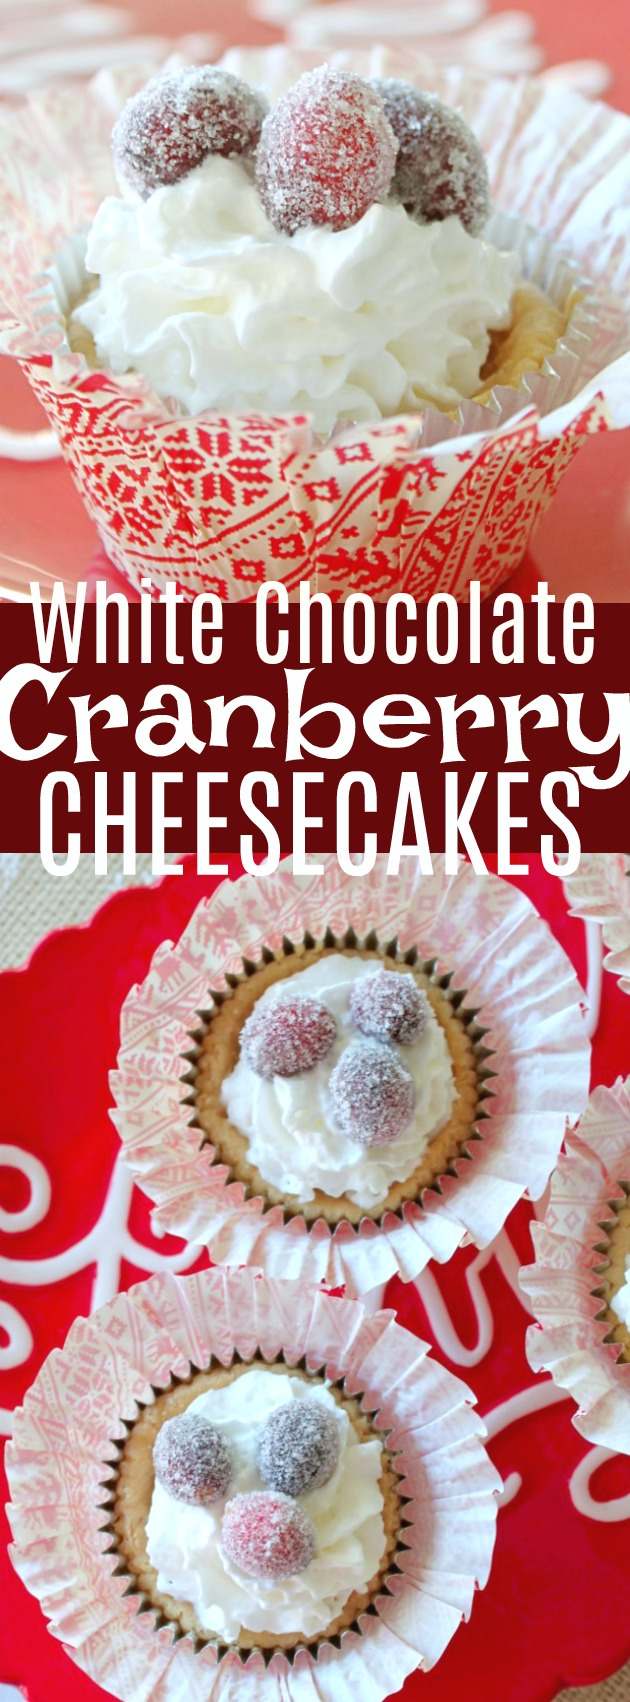 White Chocolate Cranberry Cheesecakes